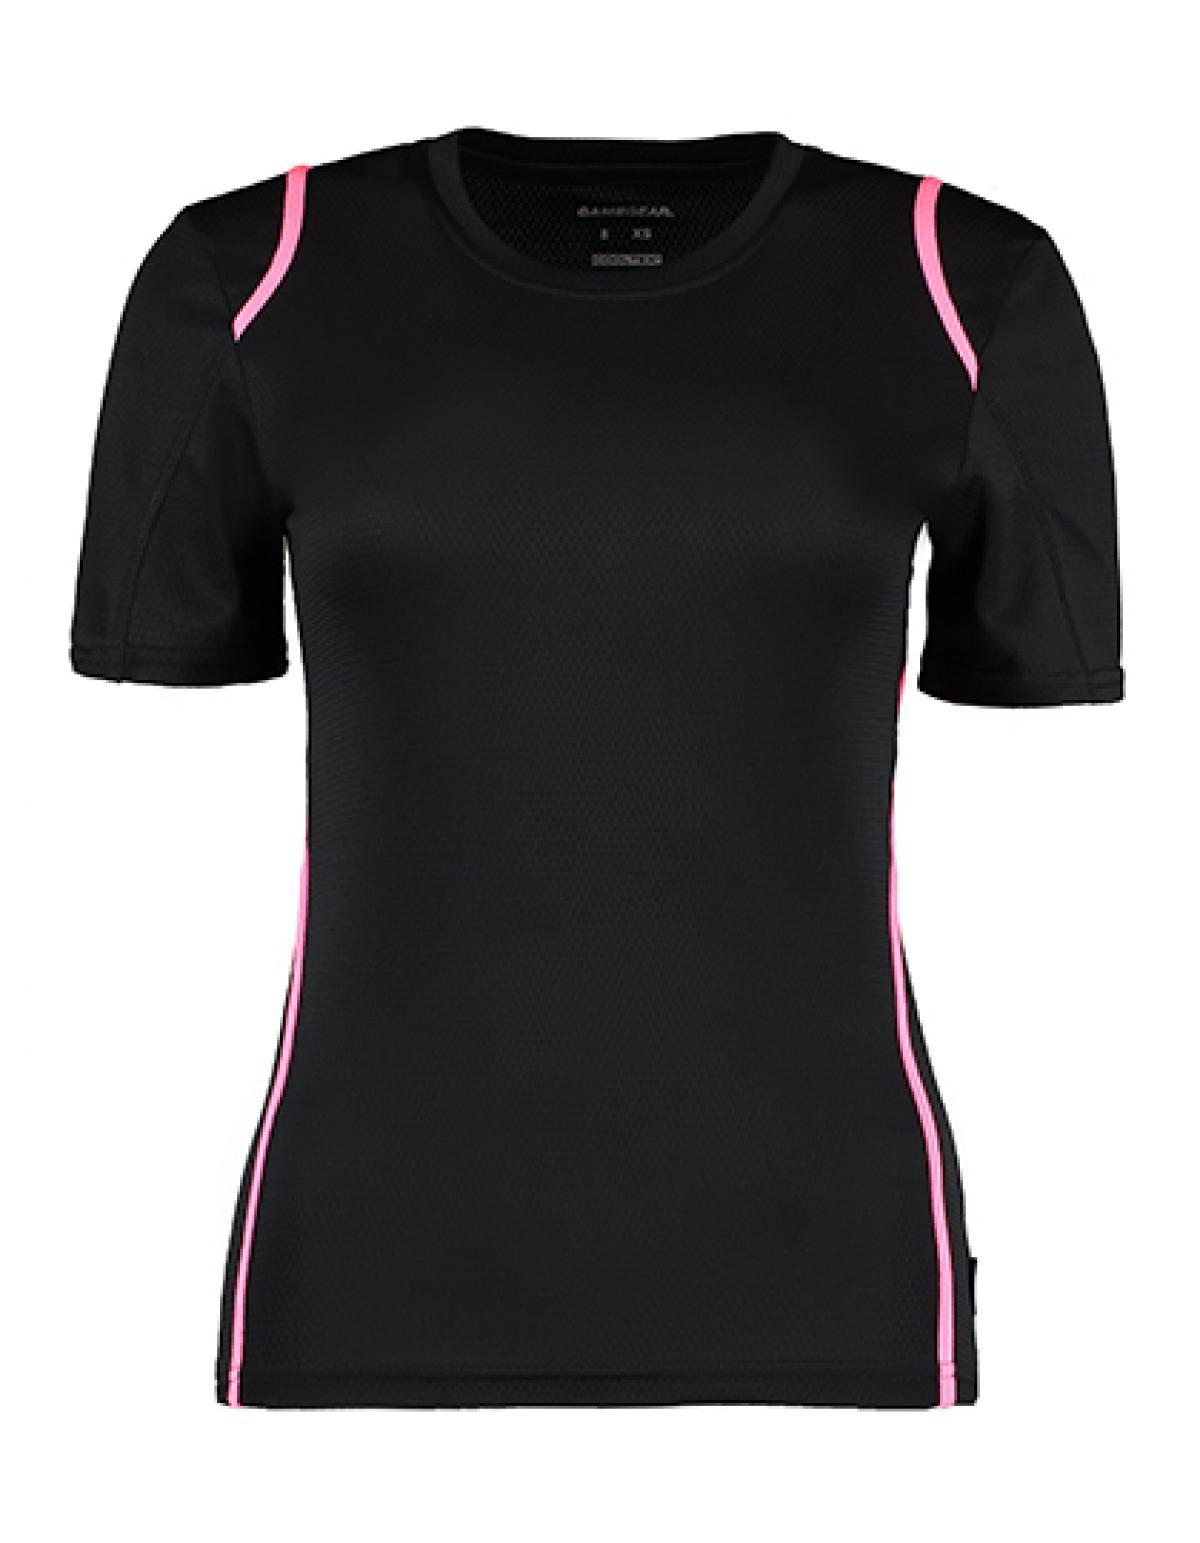 damen sport t shirt short sleeve atmungsaktiv rexlander s. Black Bedroom Furniture Sets. Home Design Ideas